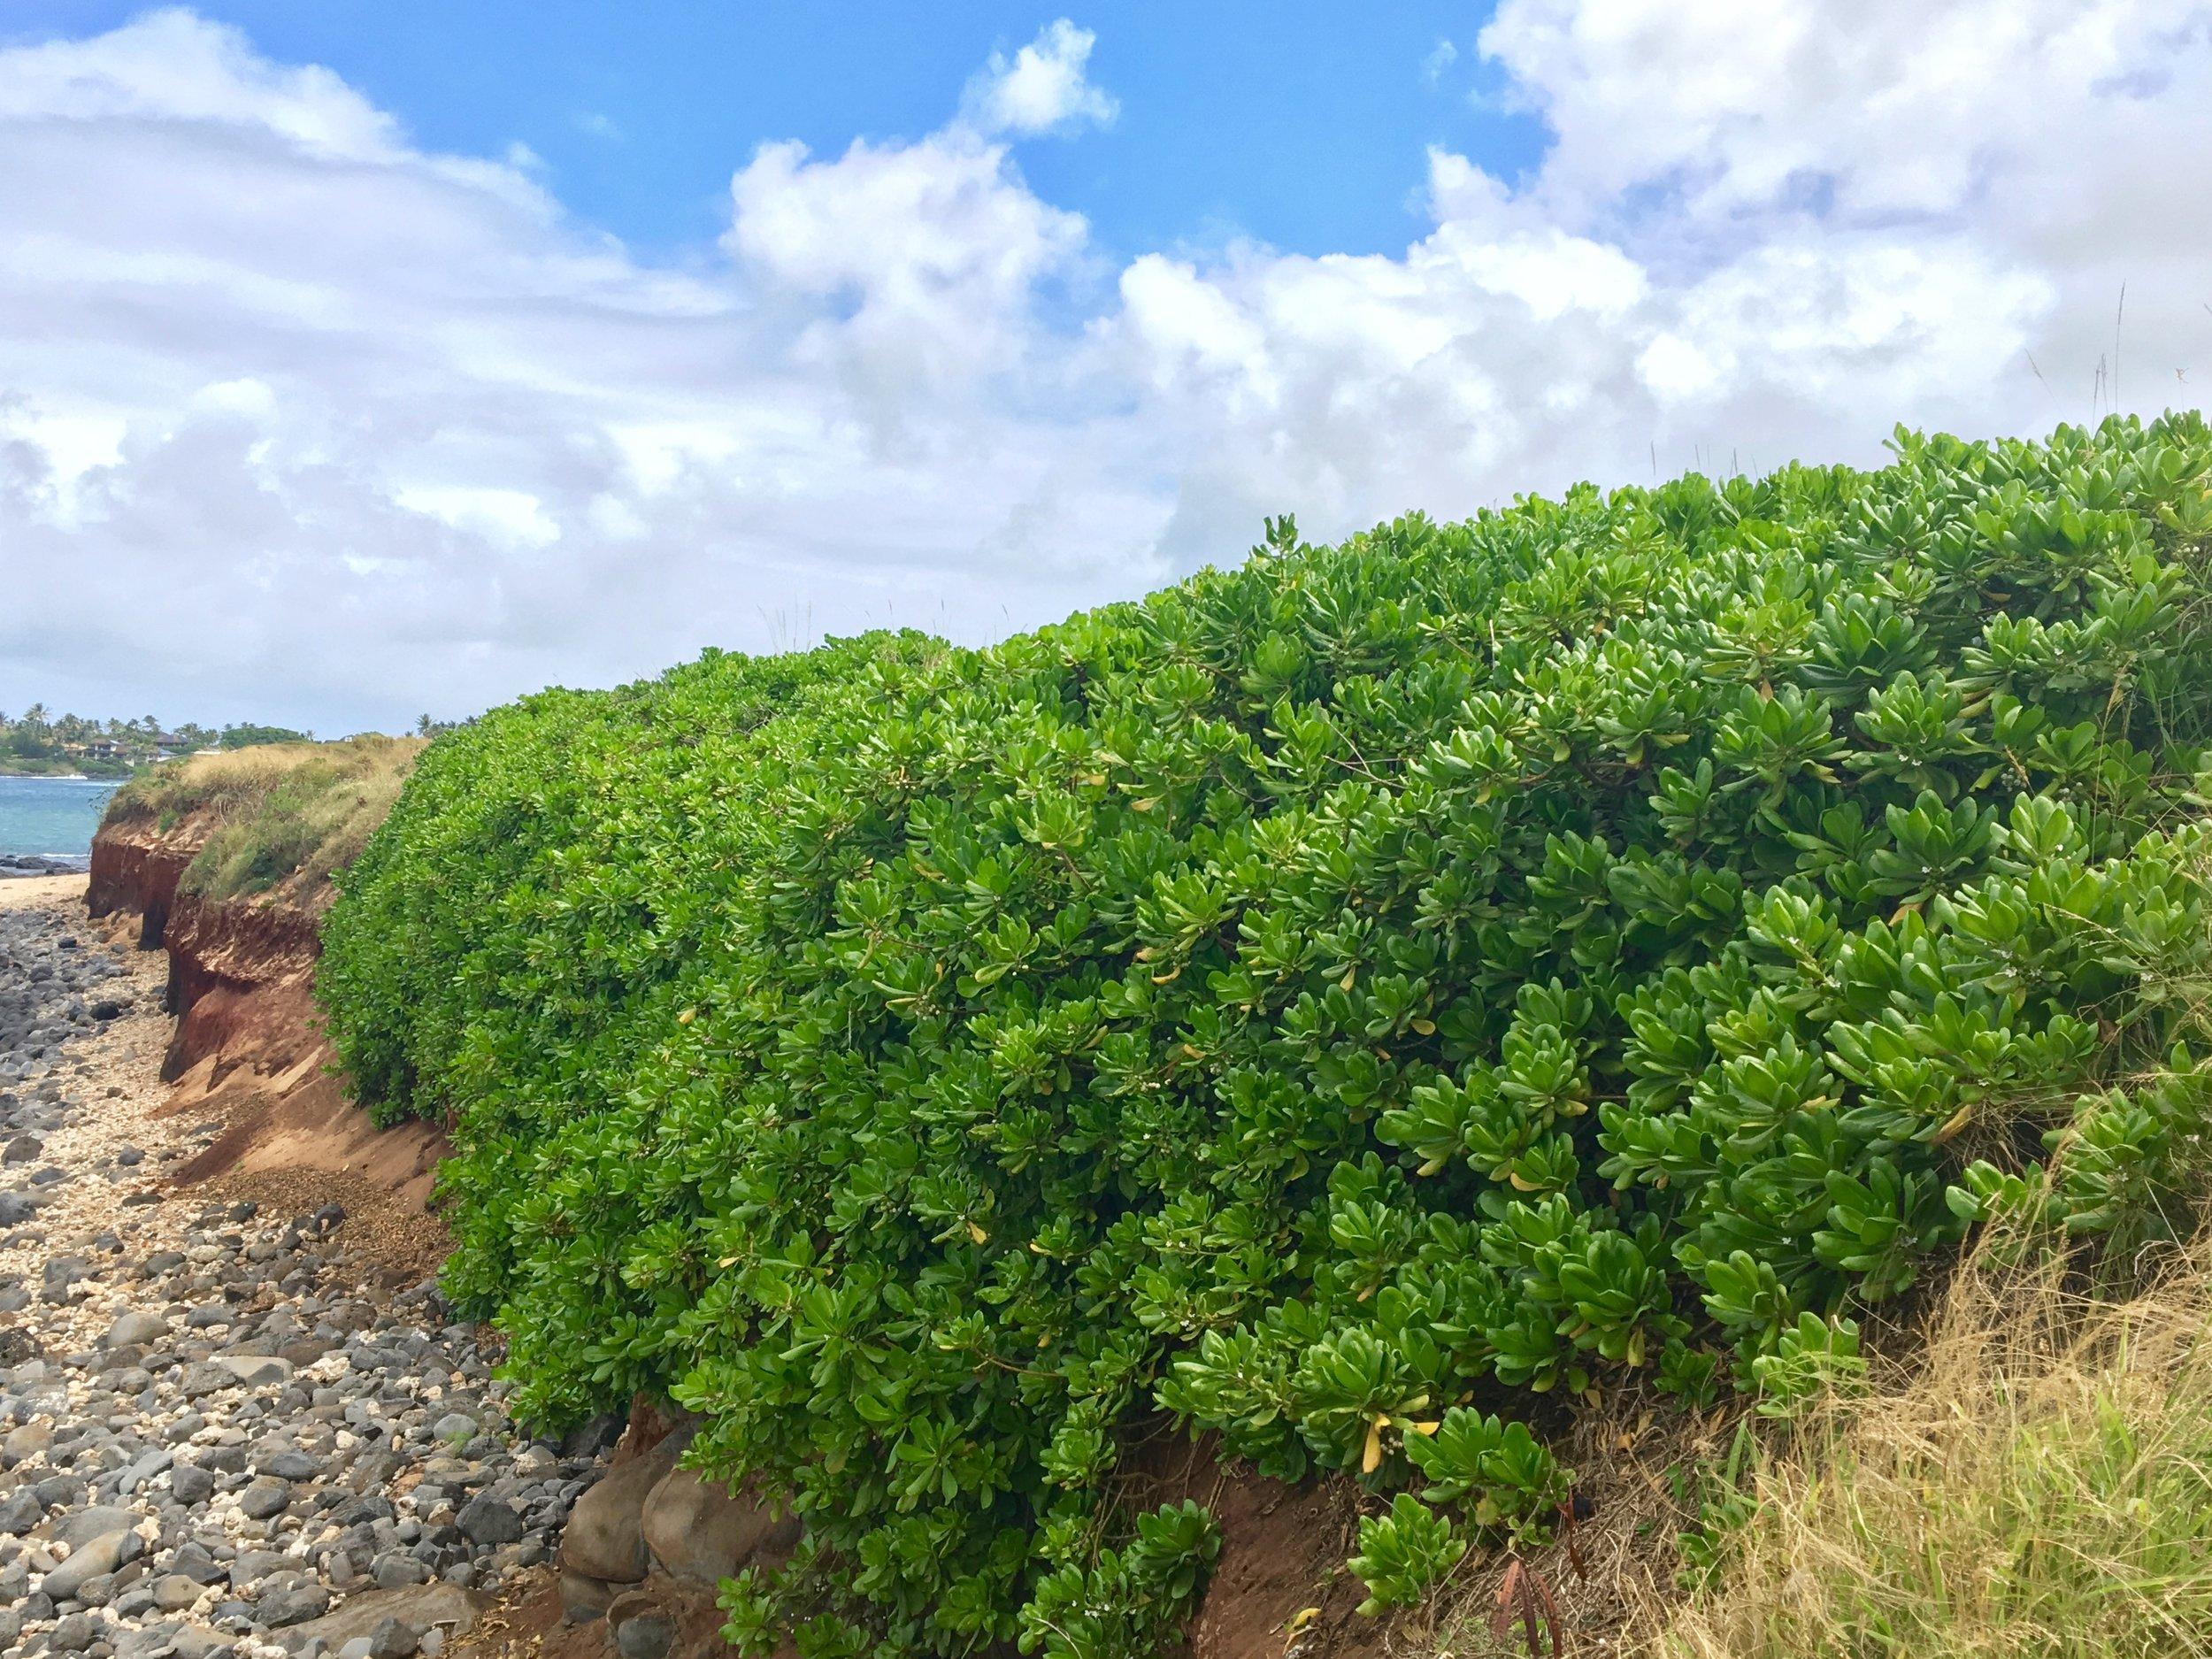 Naupaka preventing erosion of the shoreline